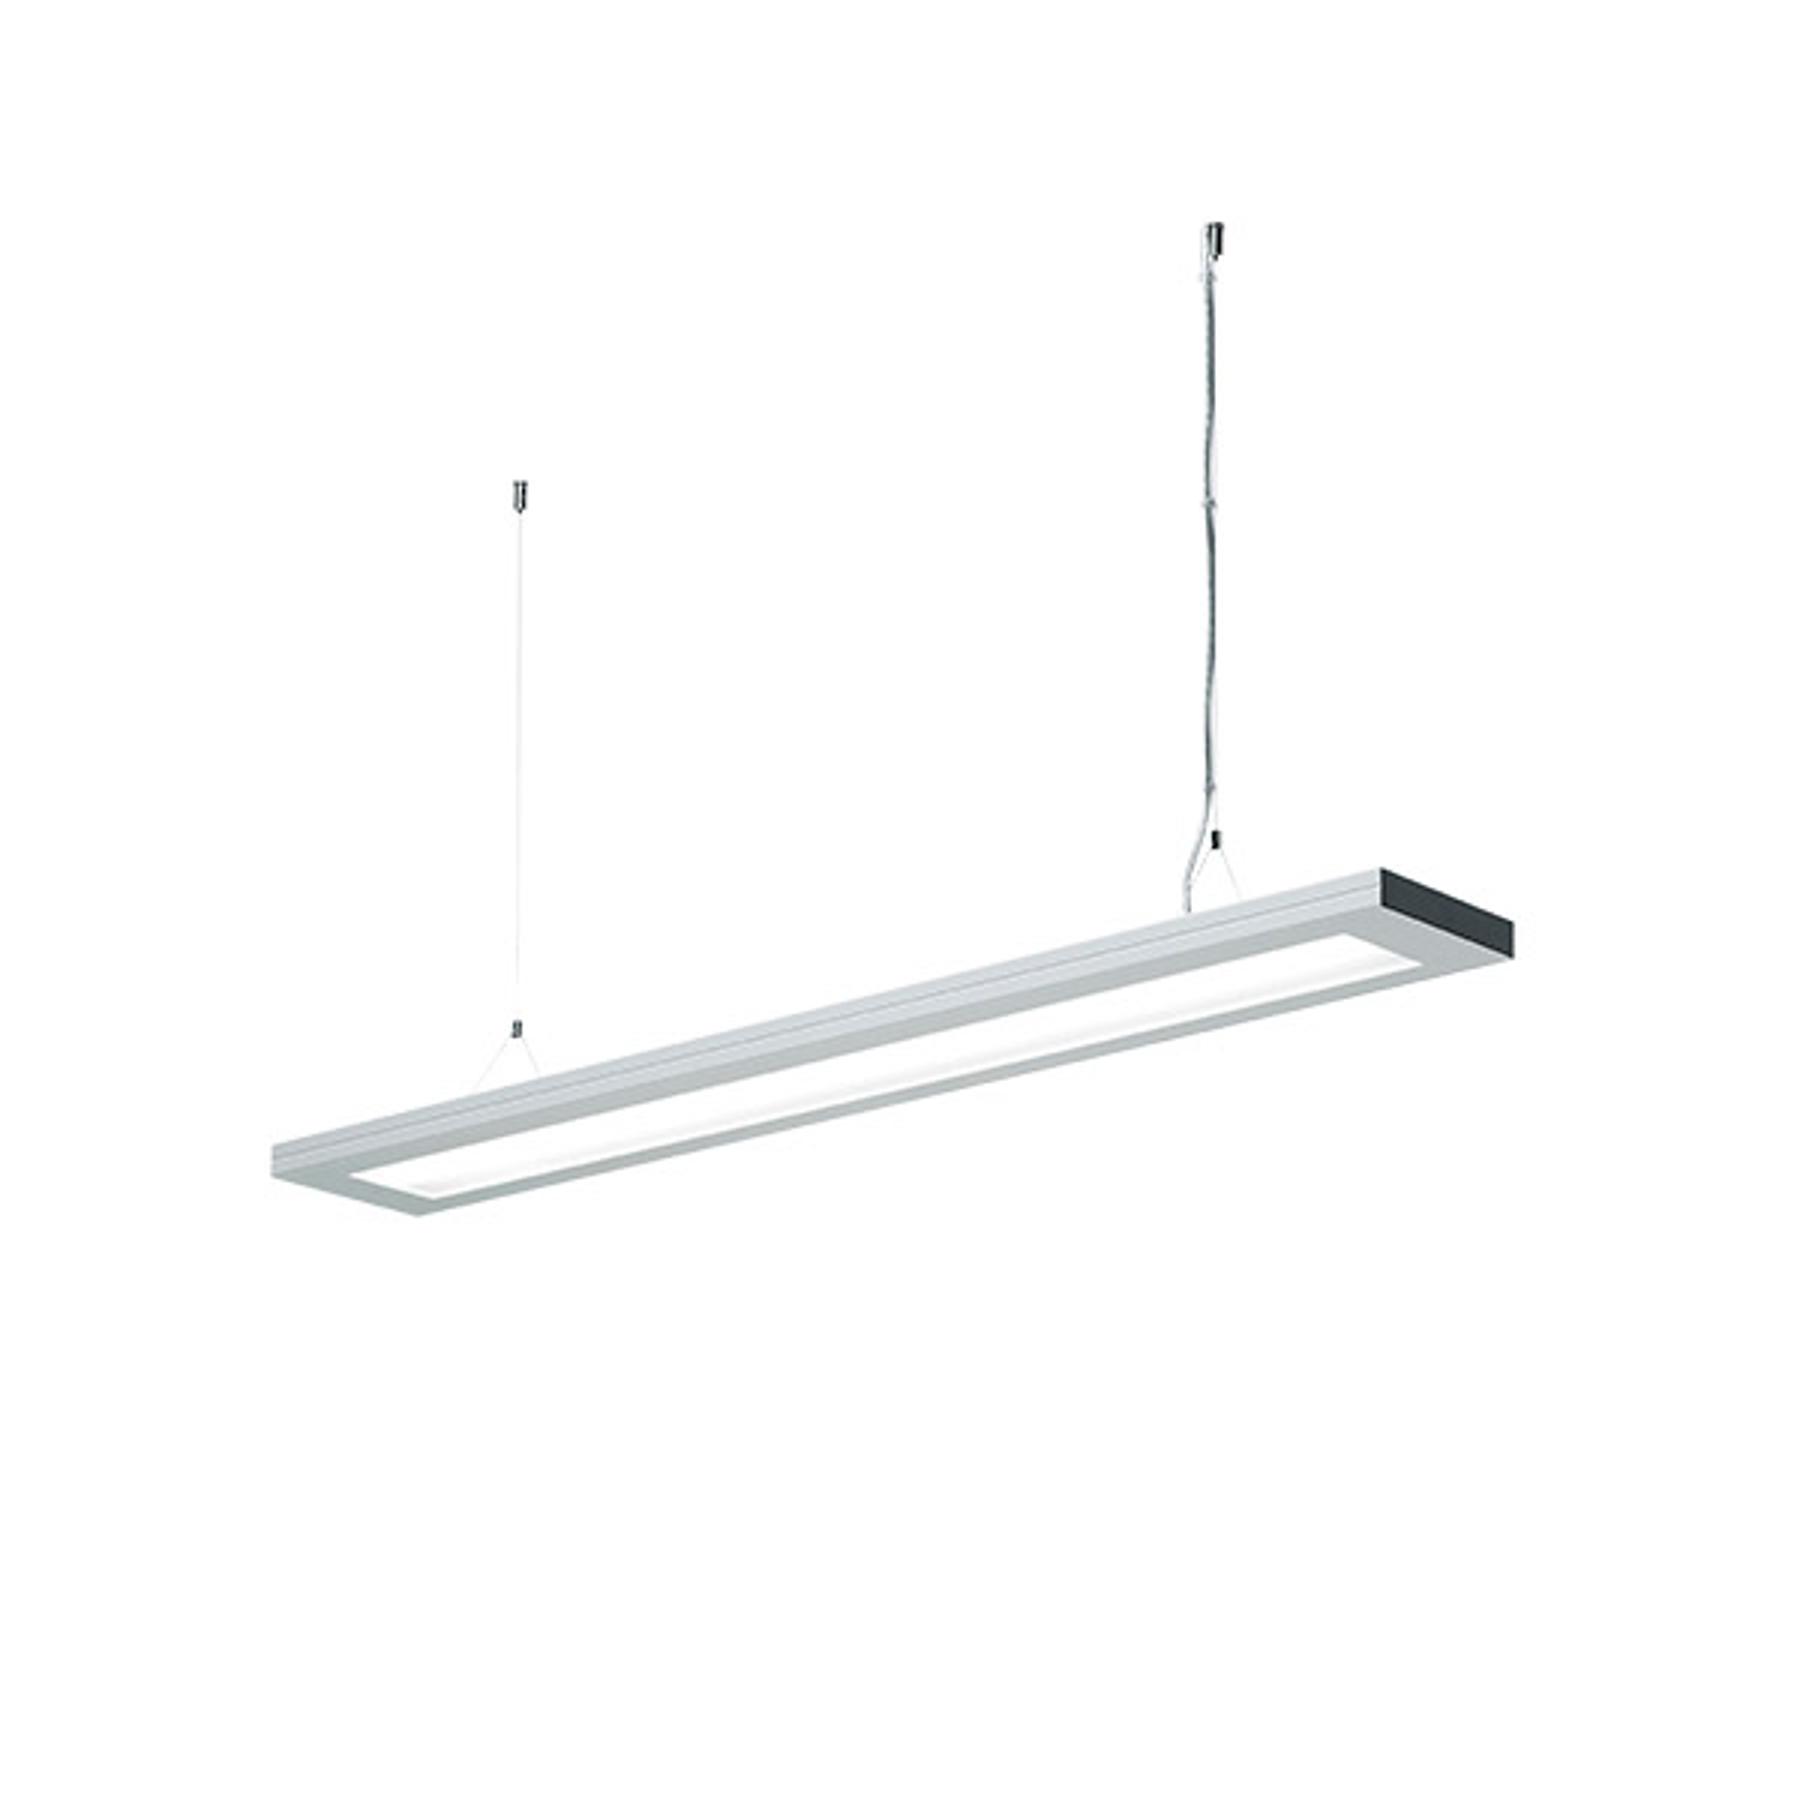 Lampa wisząca Lavigo DPP 16000/840/D EVG srebrna